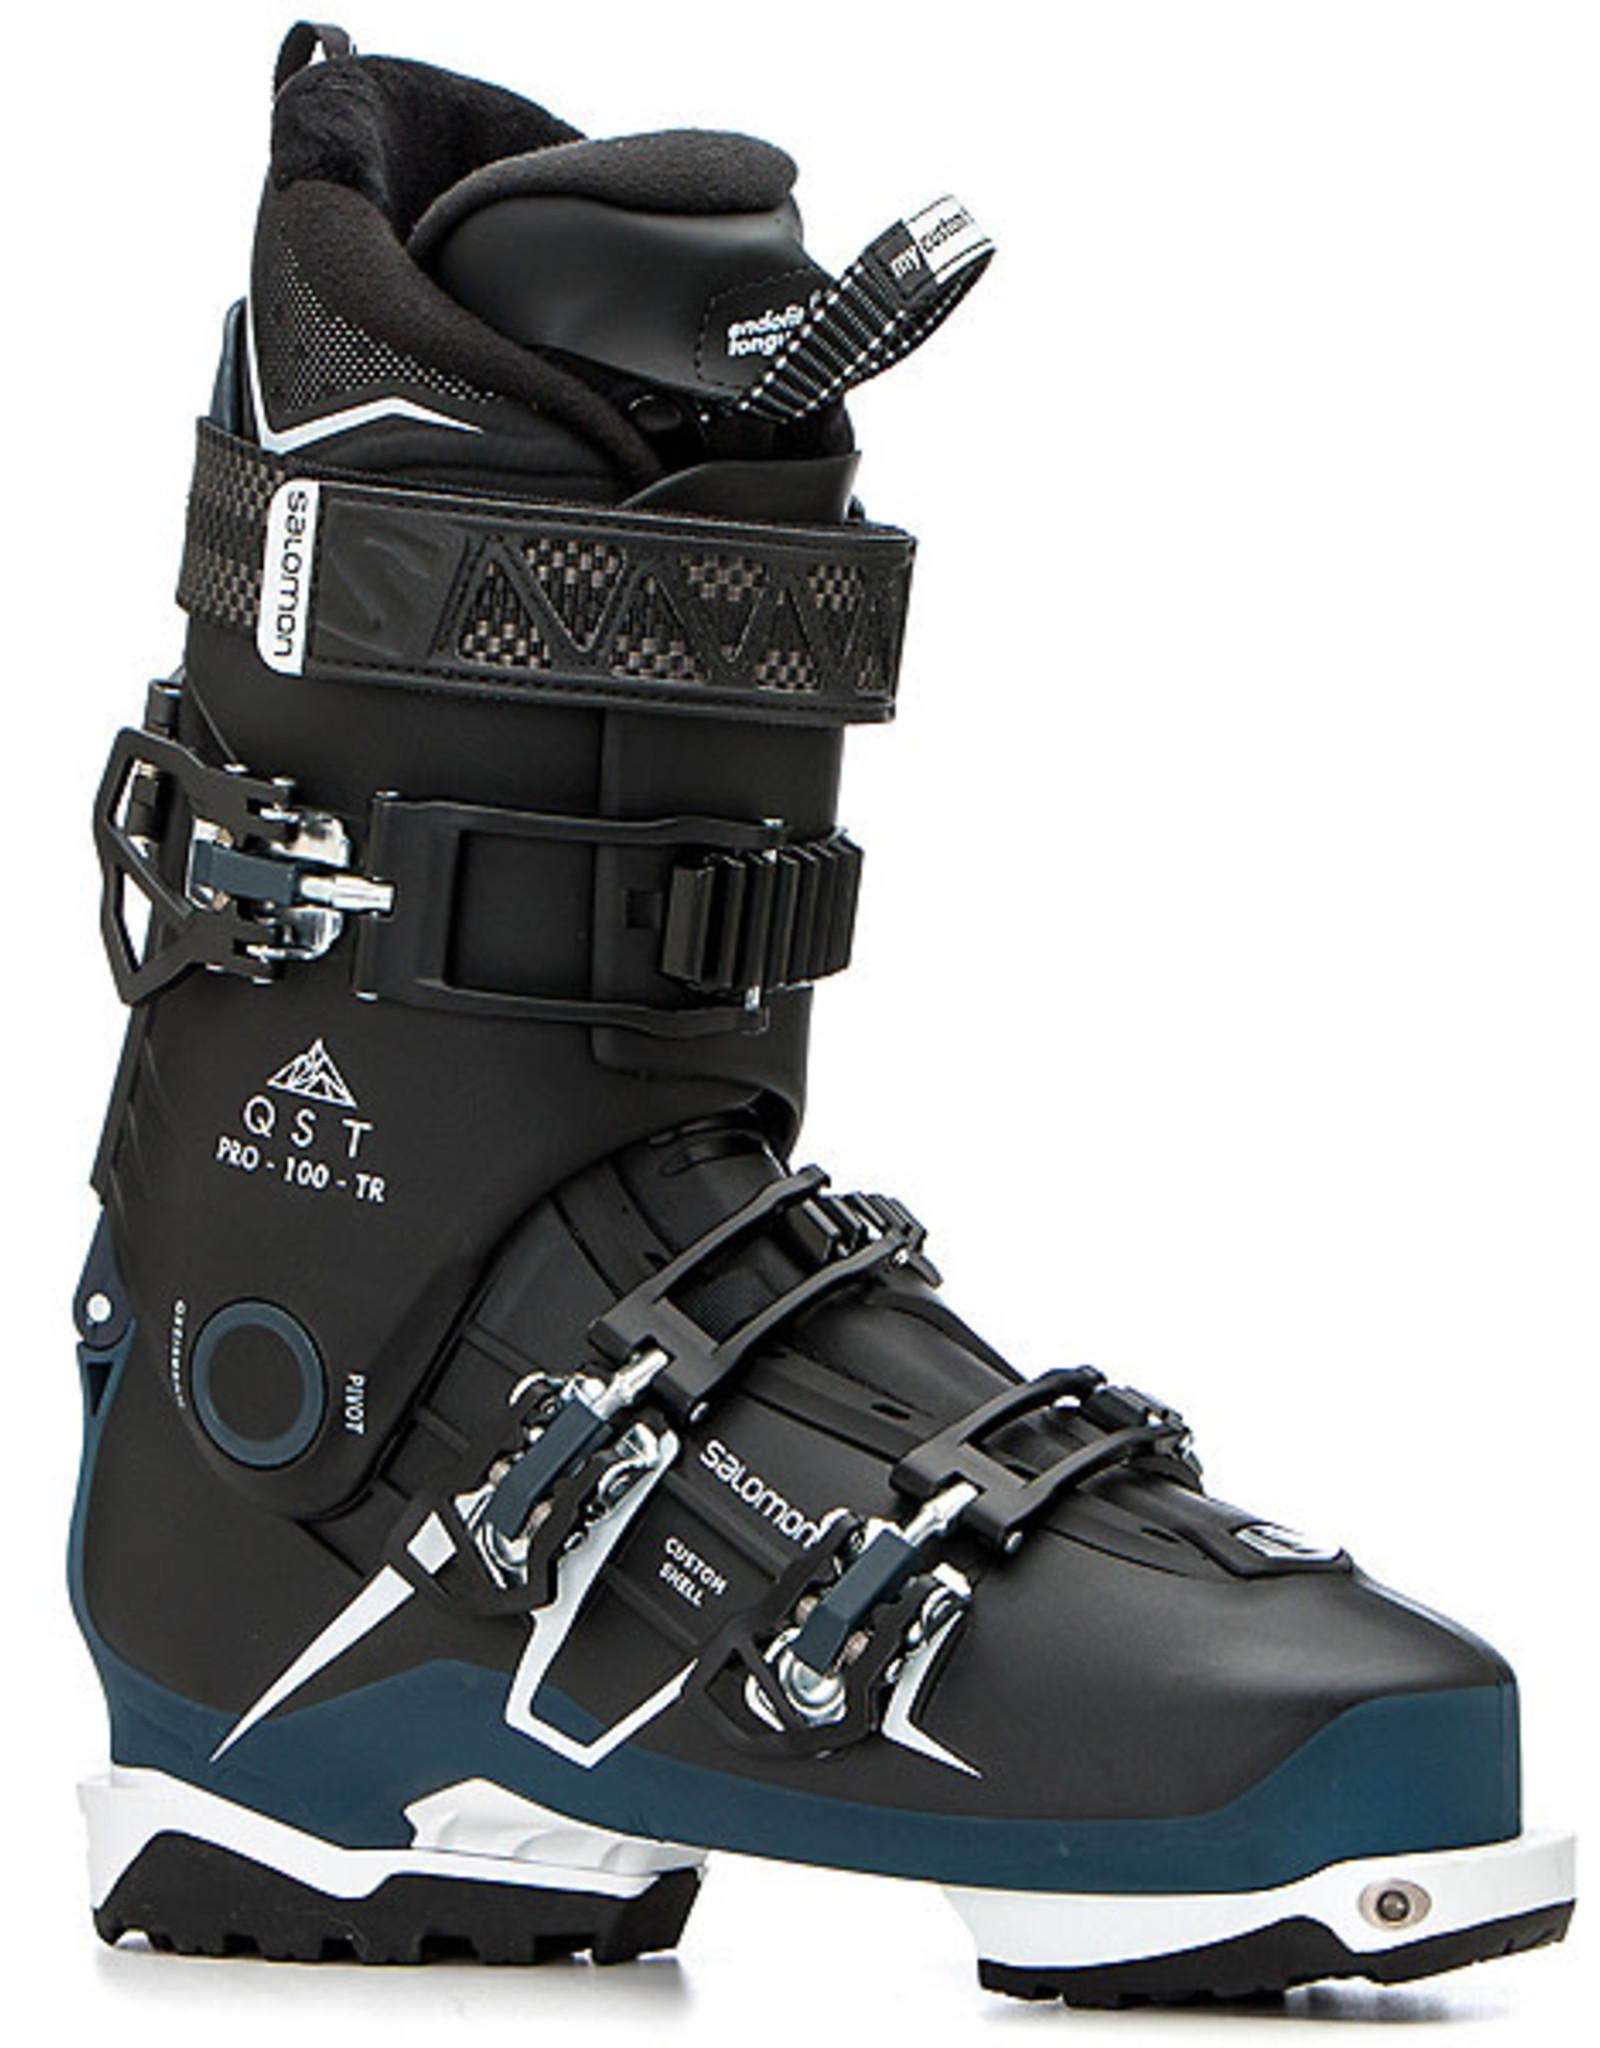 Salomon SALOMON Ski Boots QST PRO 100 TR (19/20)